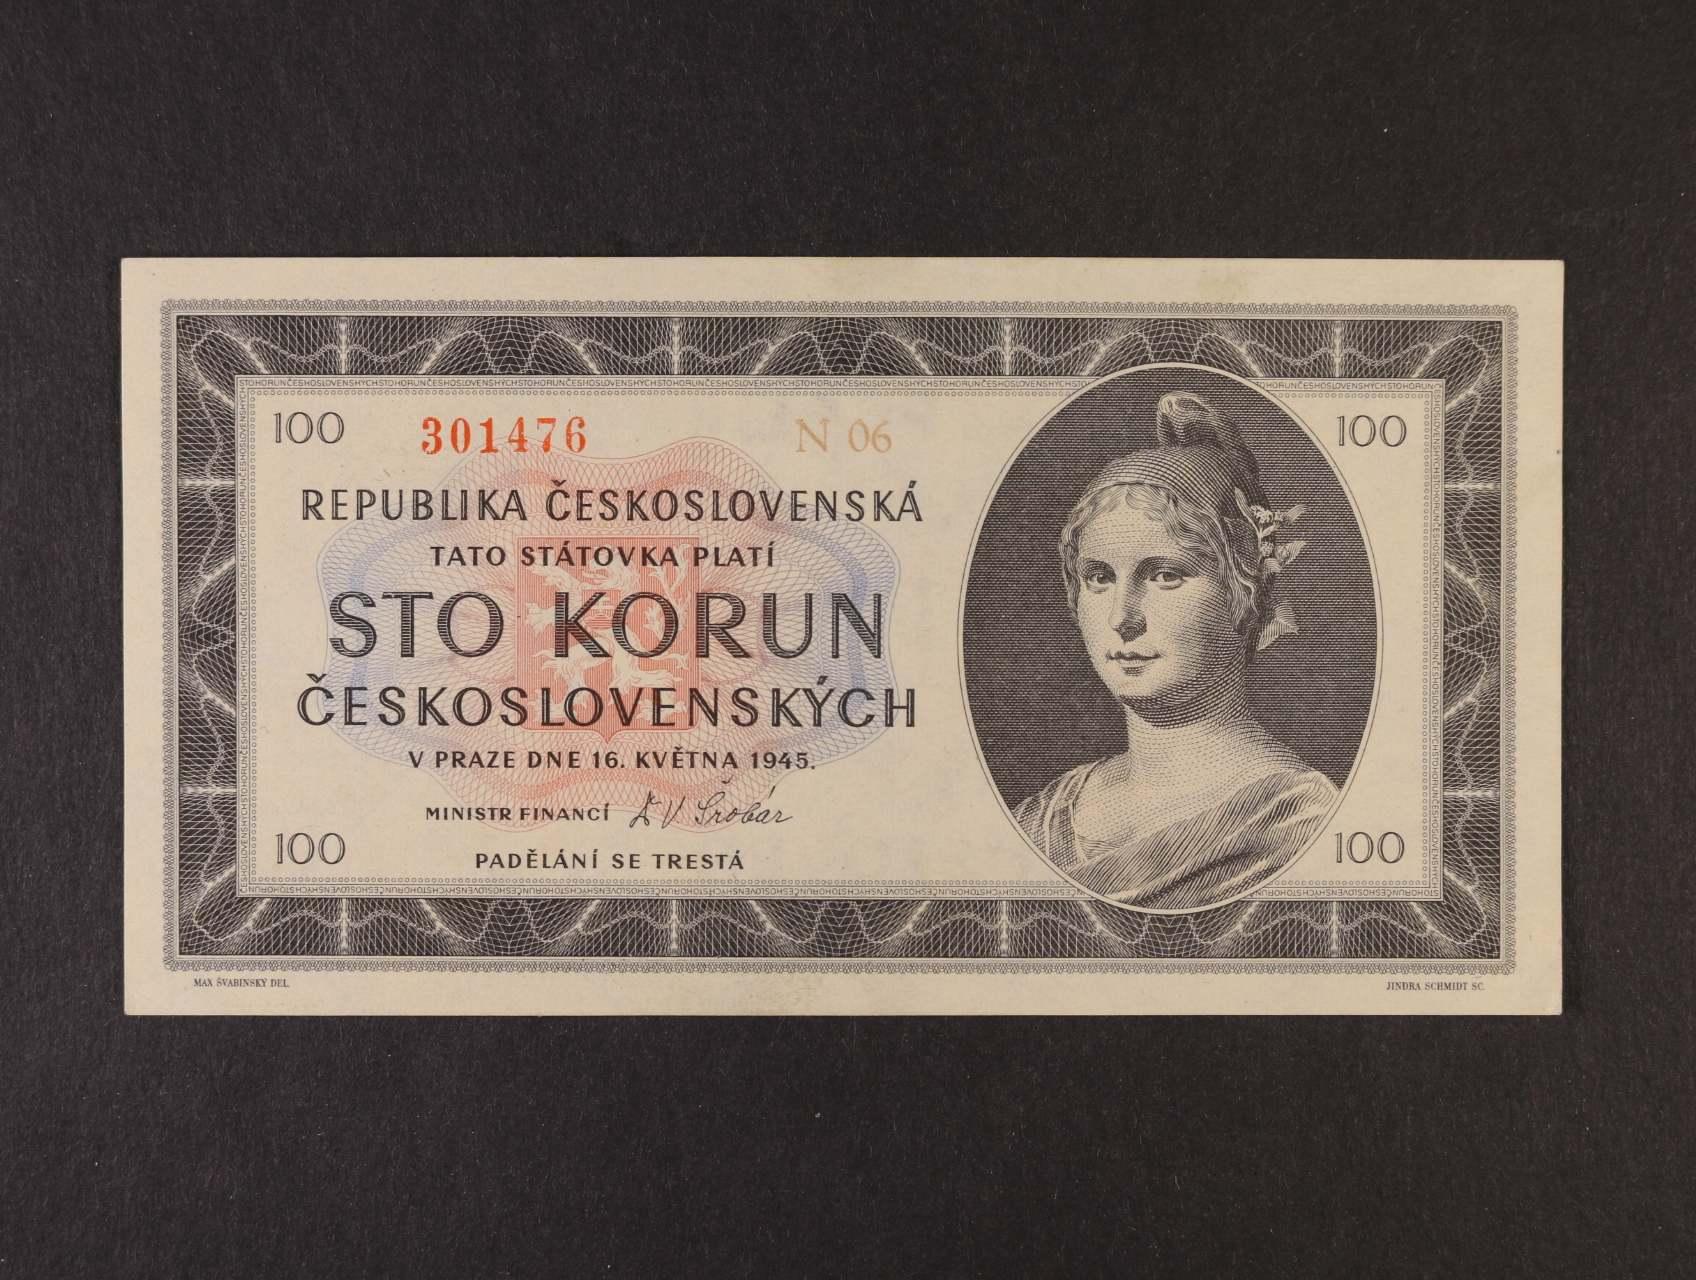 100 Kčs 16.5.1945 série N 06, Ba. 77c, Pi. 67a